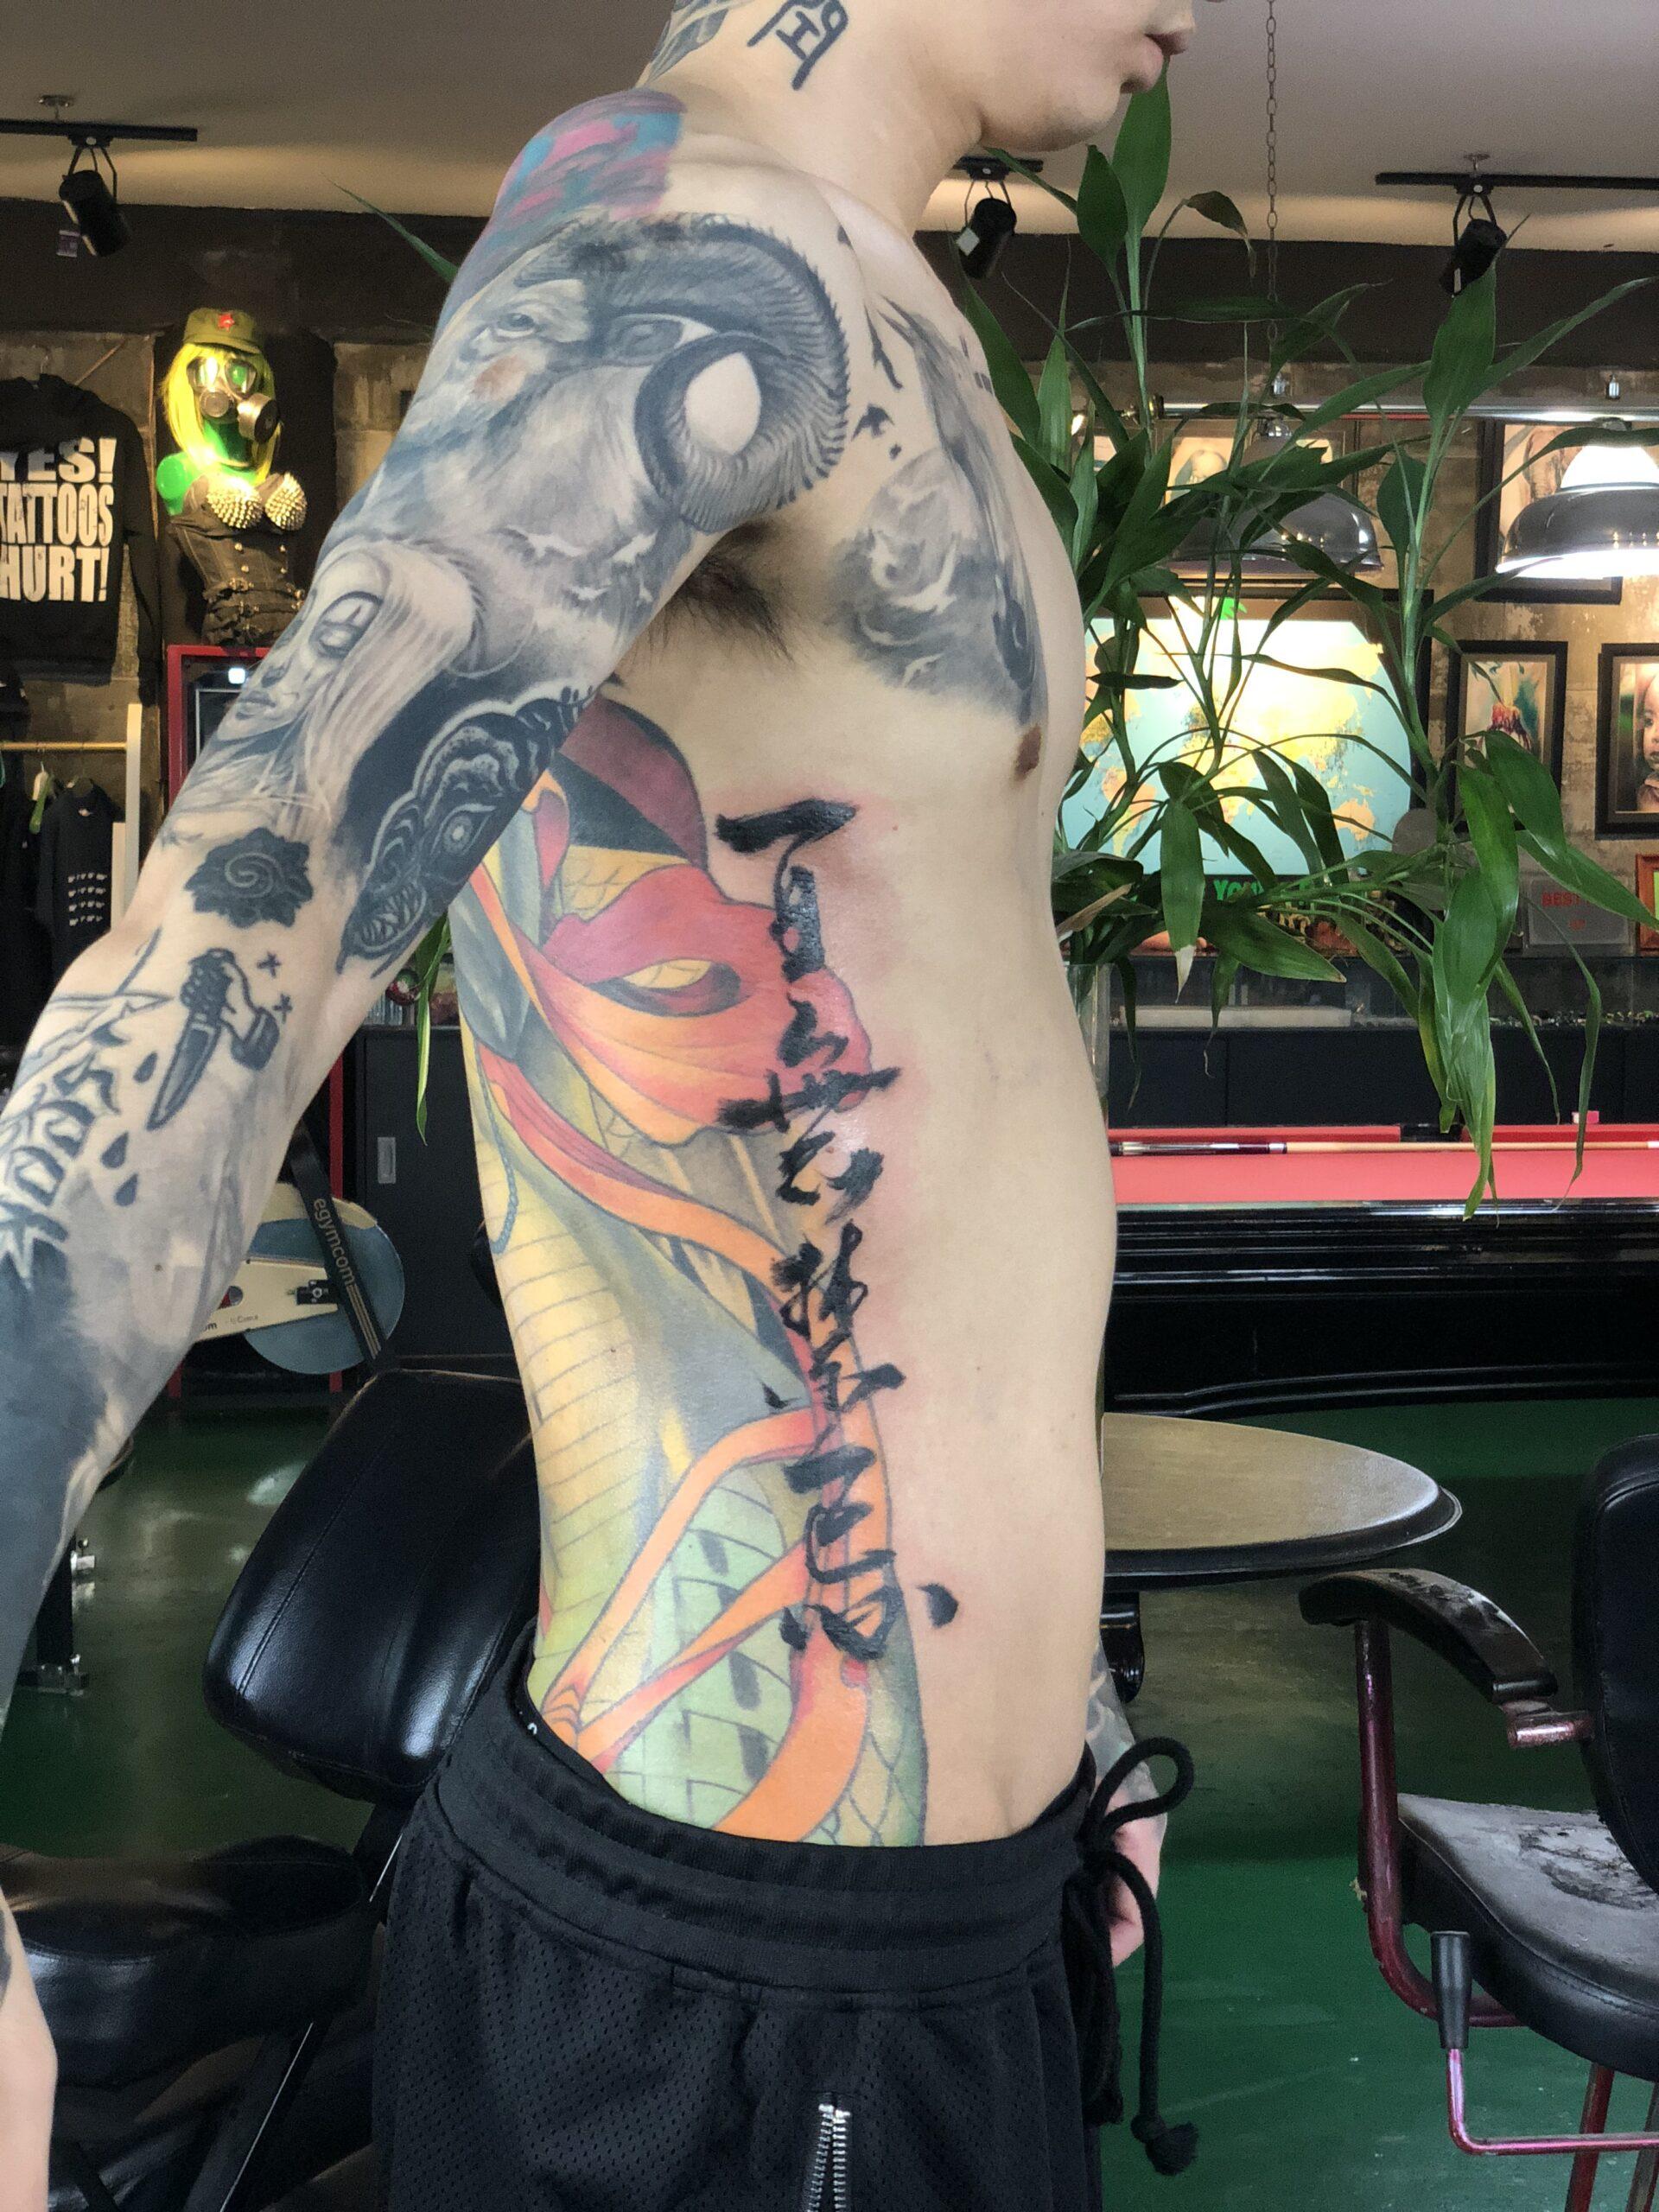 zhuo dan ting tattoo work 卓丹婷纹身作品 百无禁忌 1